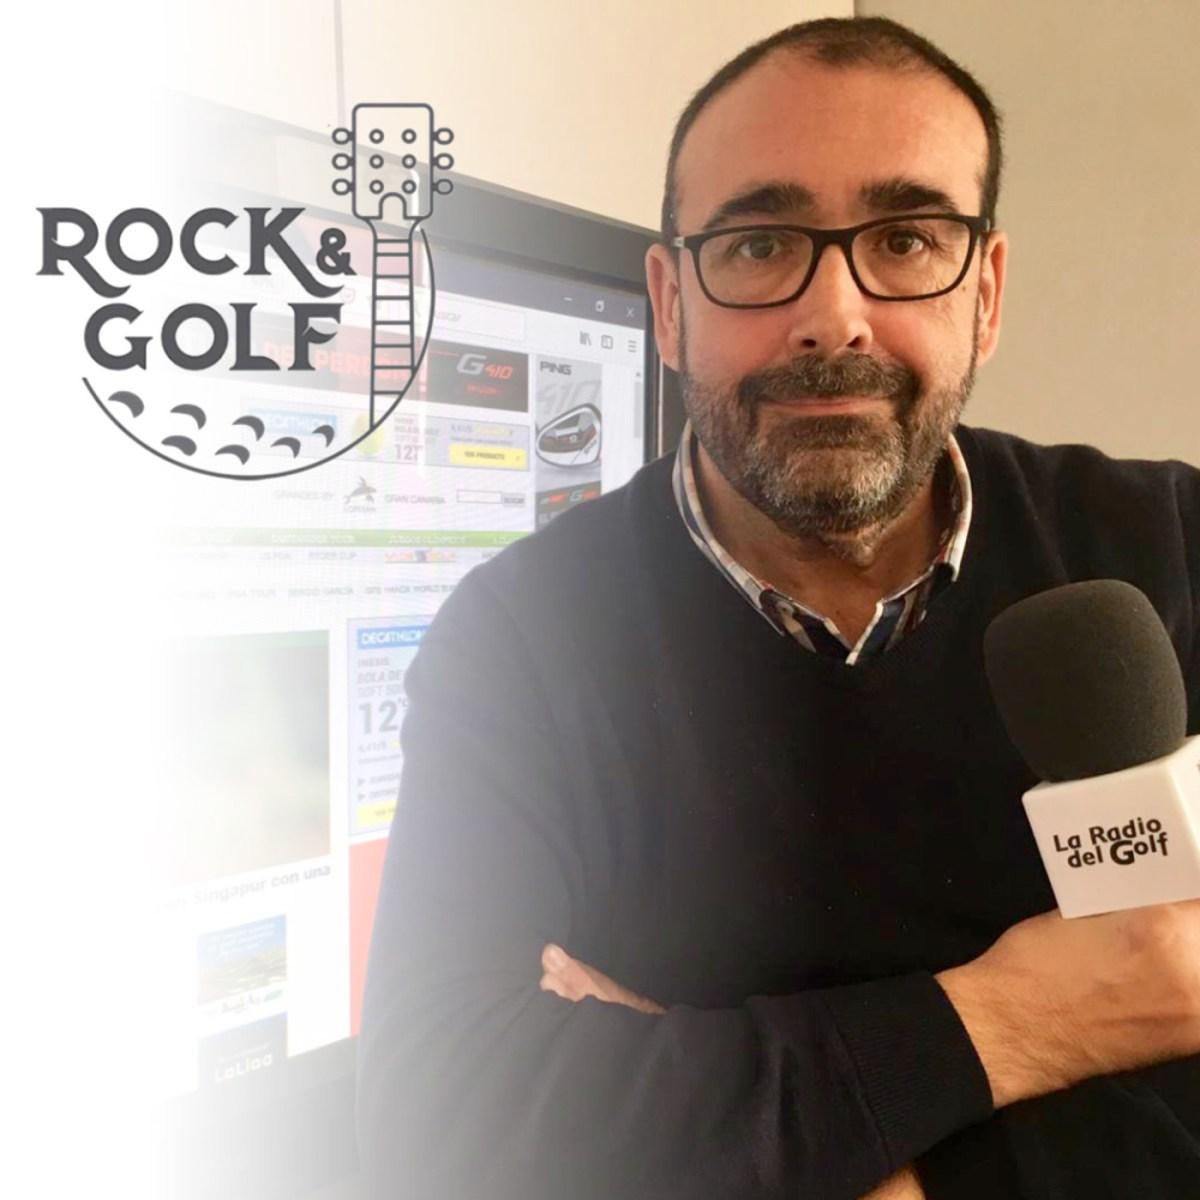 Rock & Golf